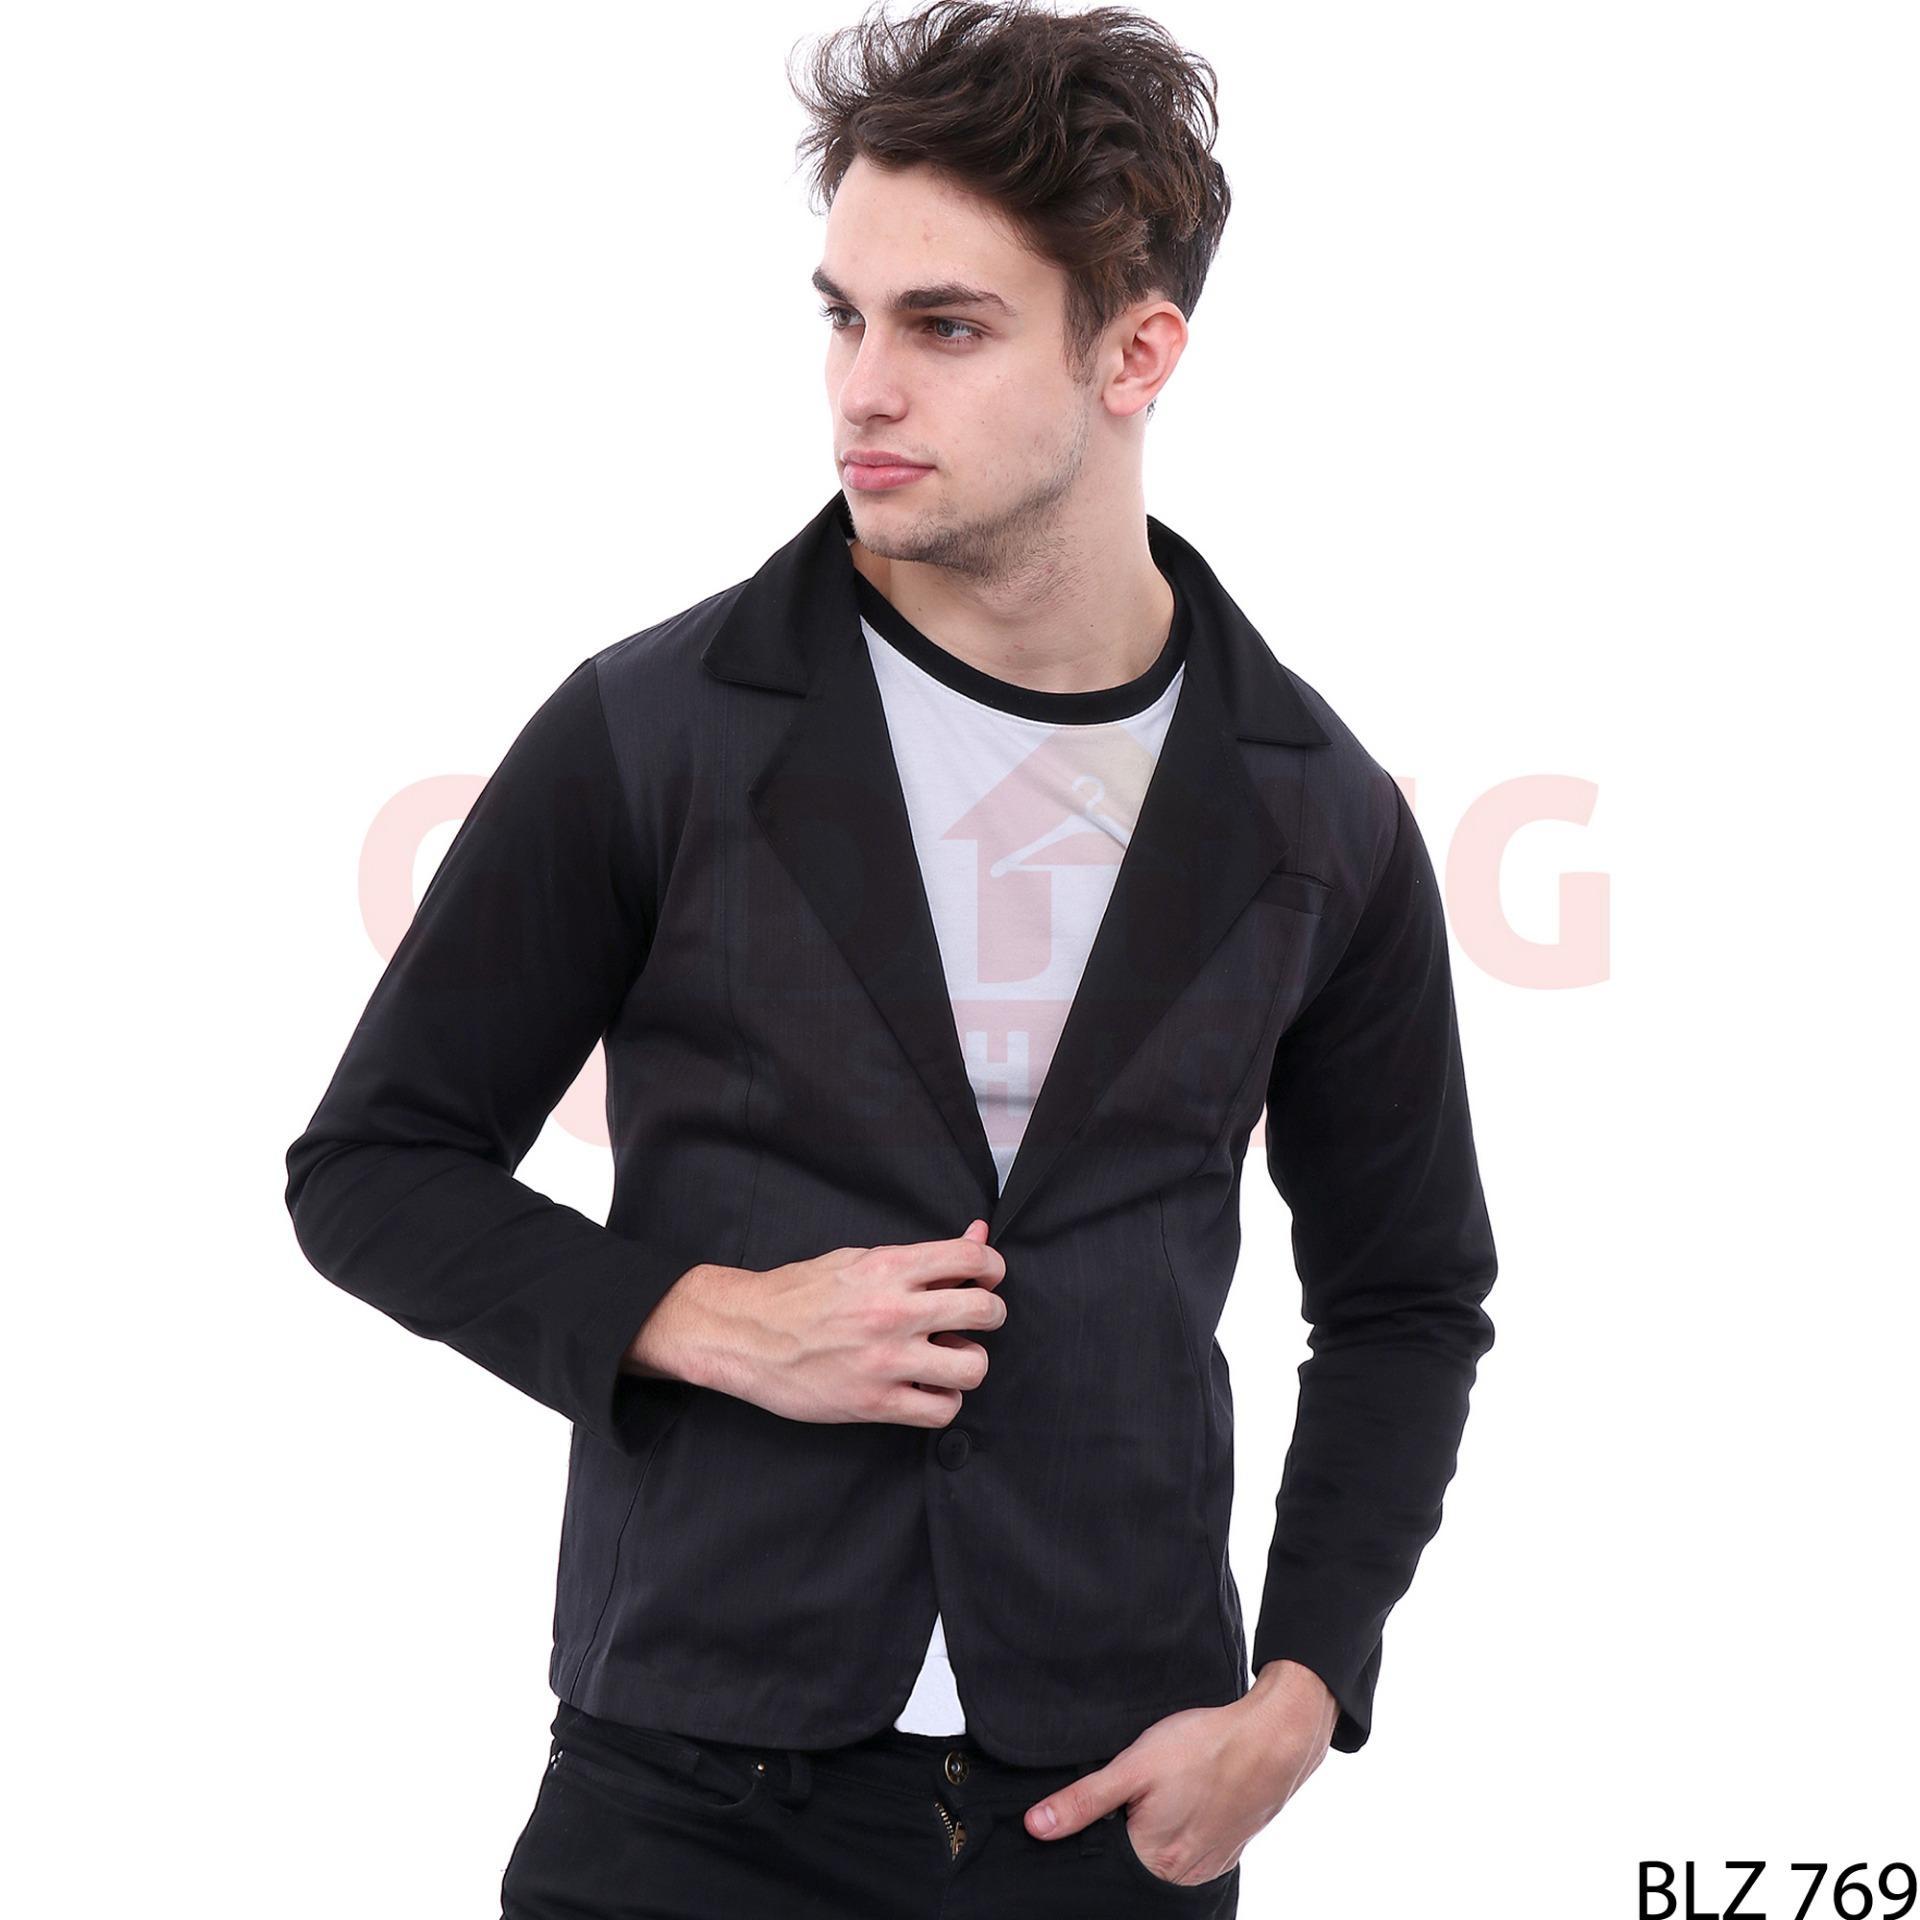 Katalog Jas Lelaki 2018 Crowsdenim Blazer Black Pria Sk85 Gudang Fashion Semi Formal